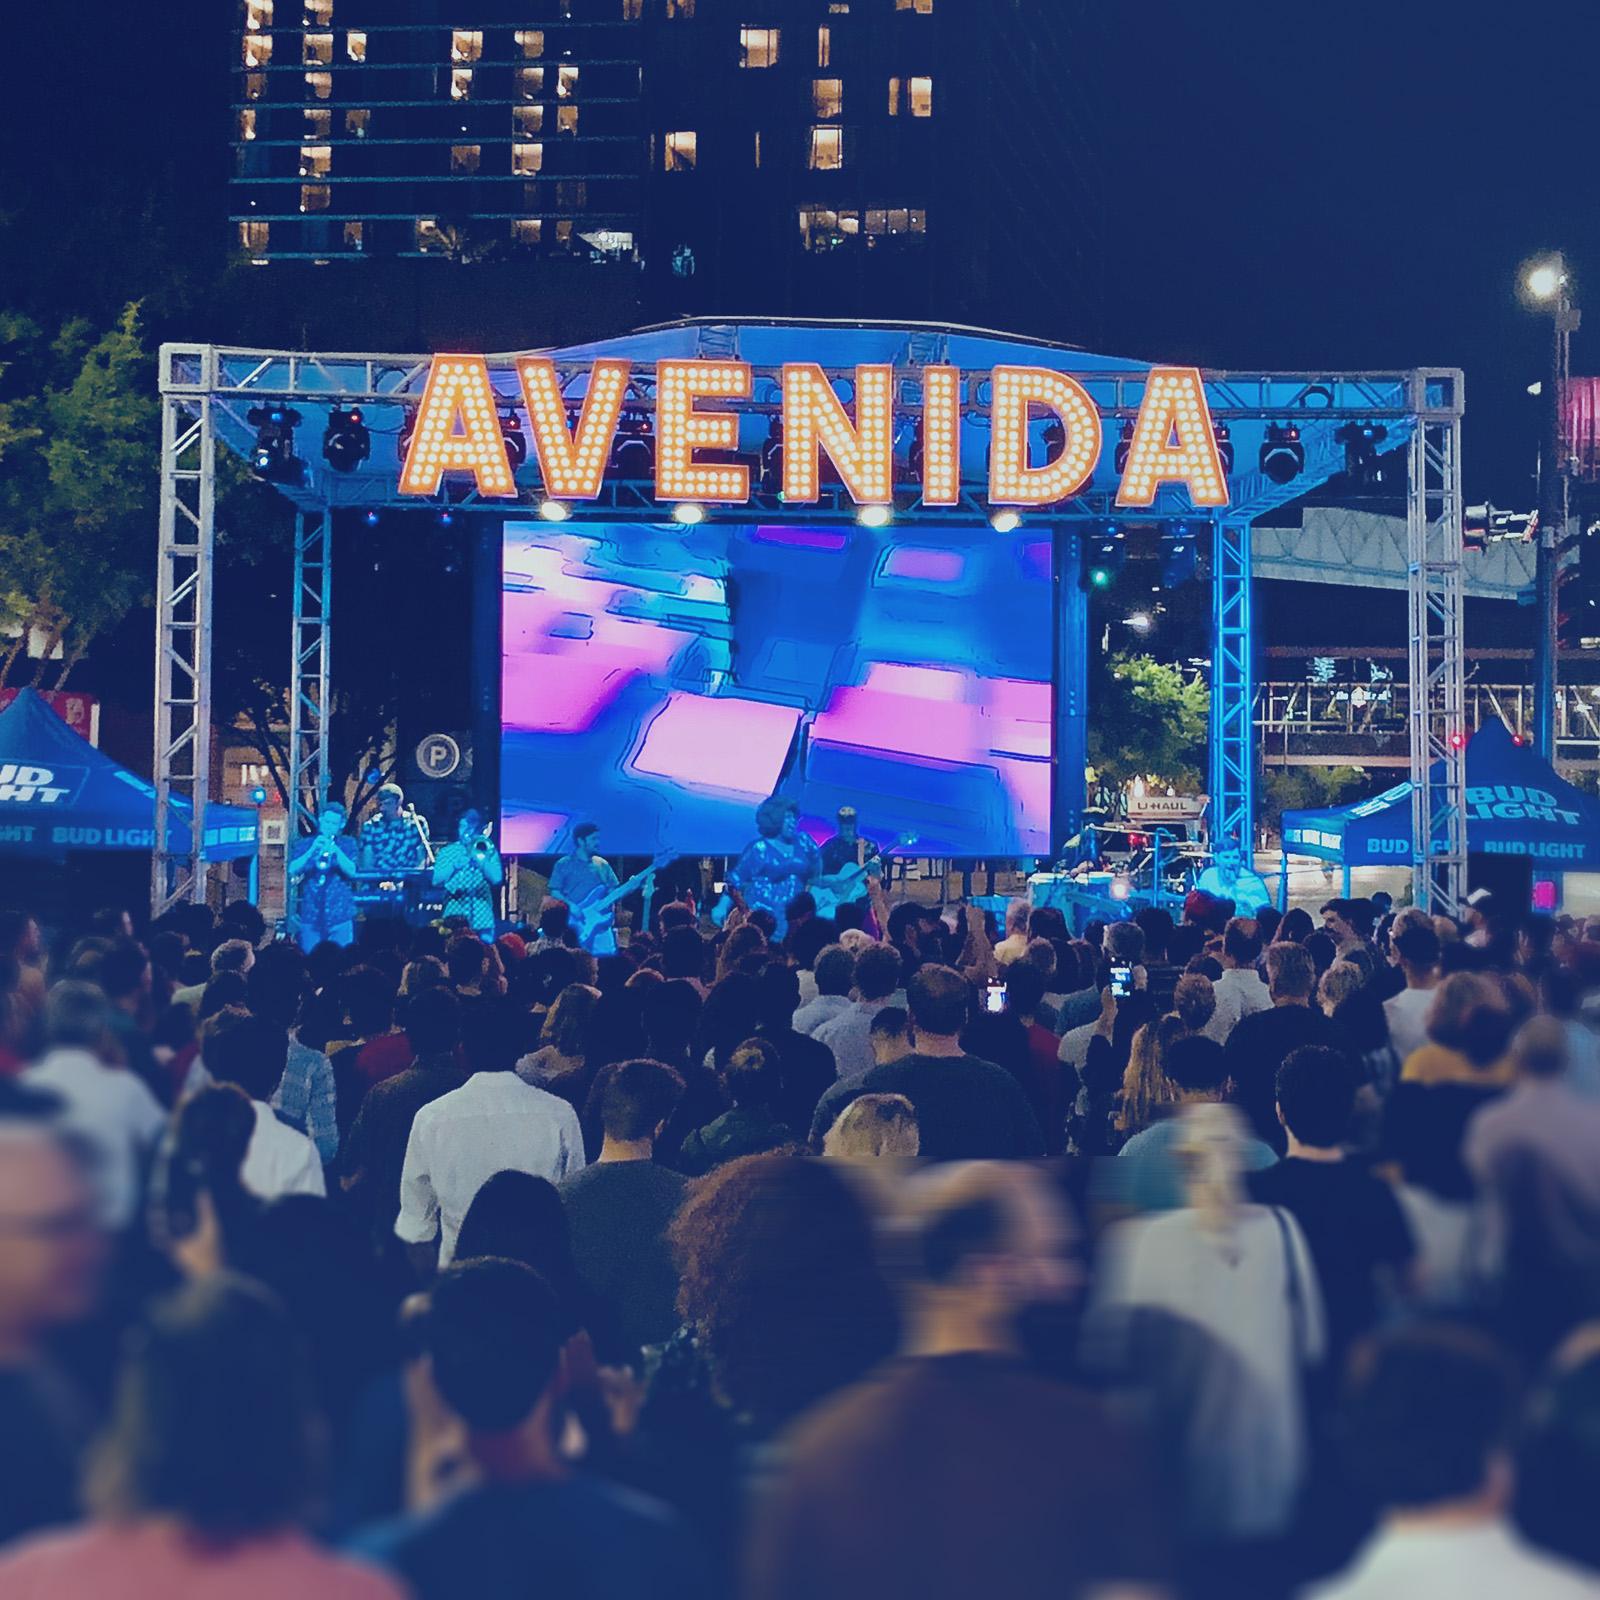 Avenida Houston Party on the Plaza Stage